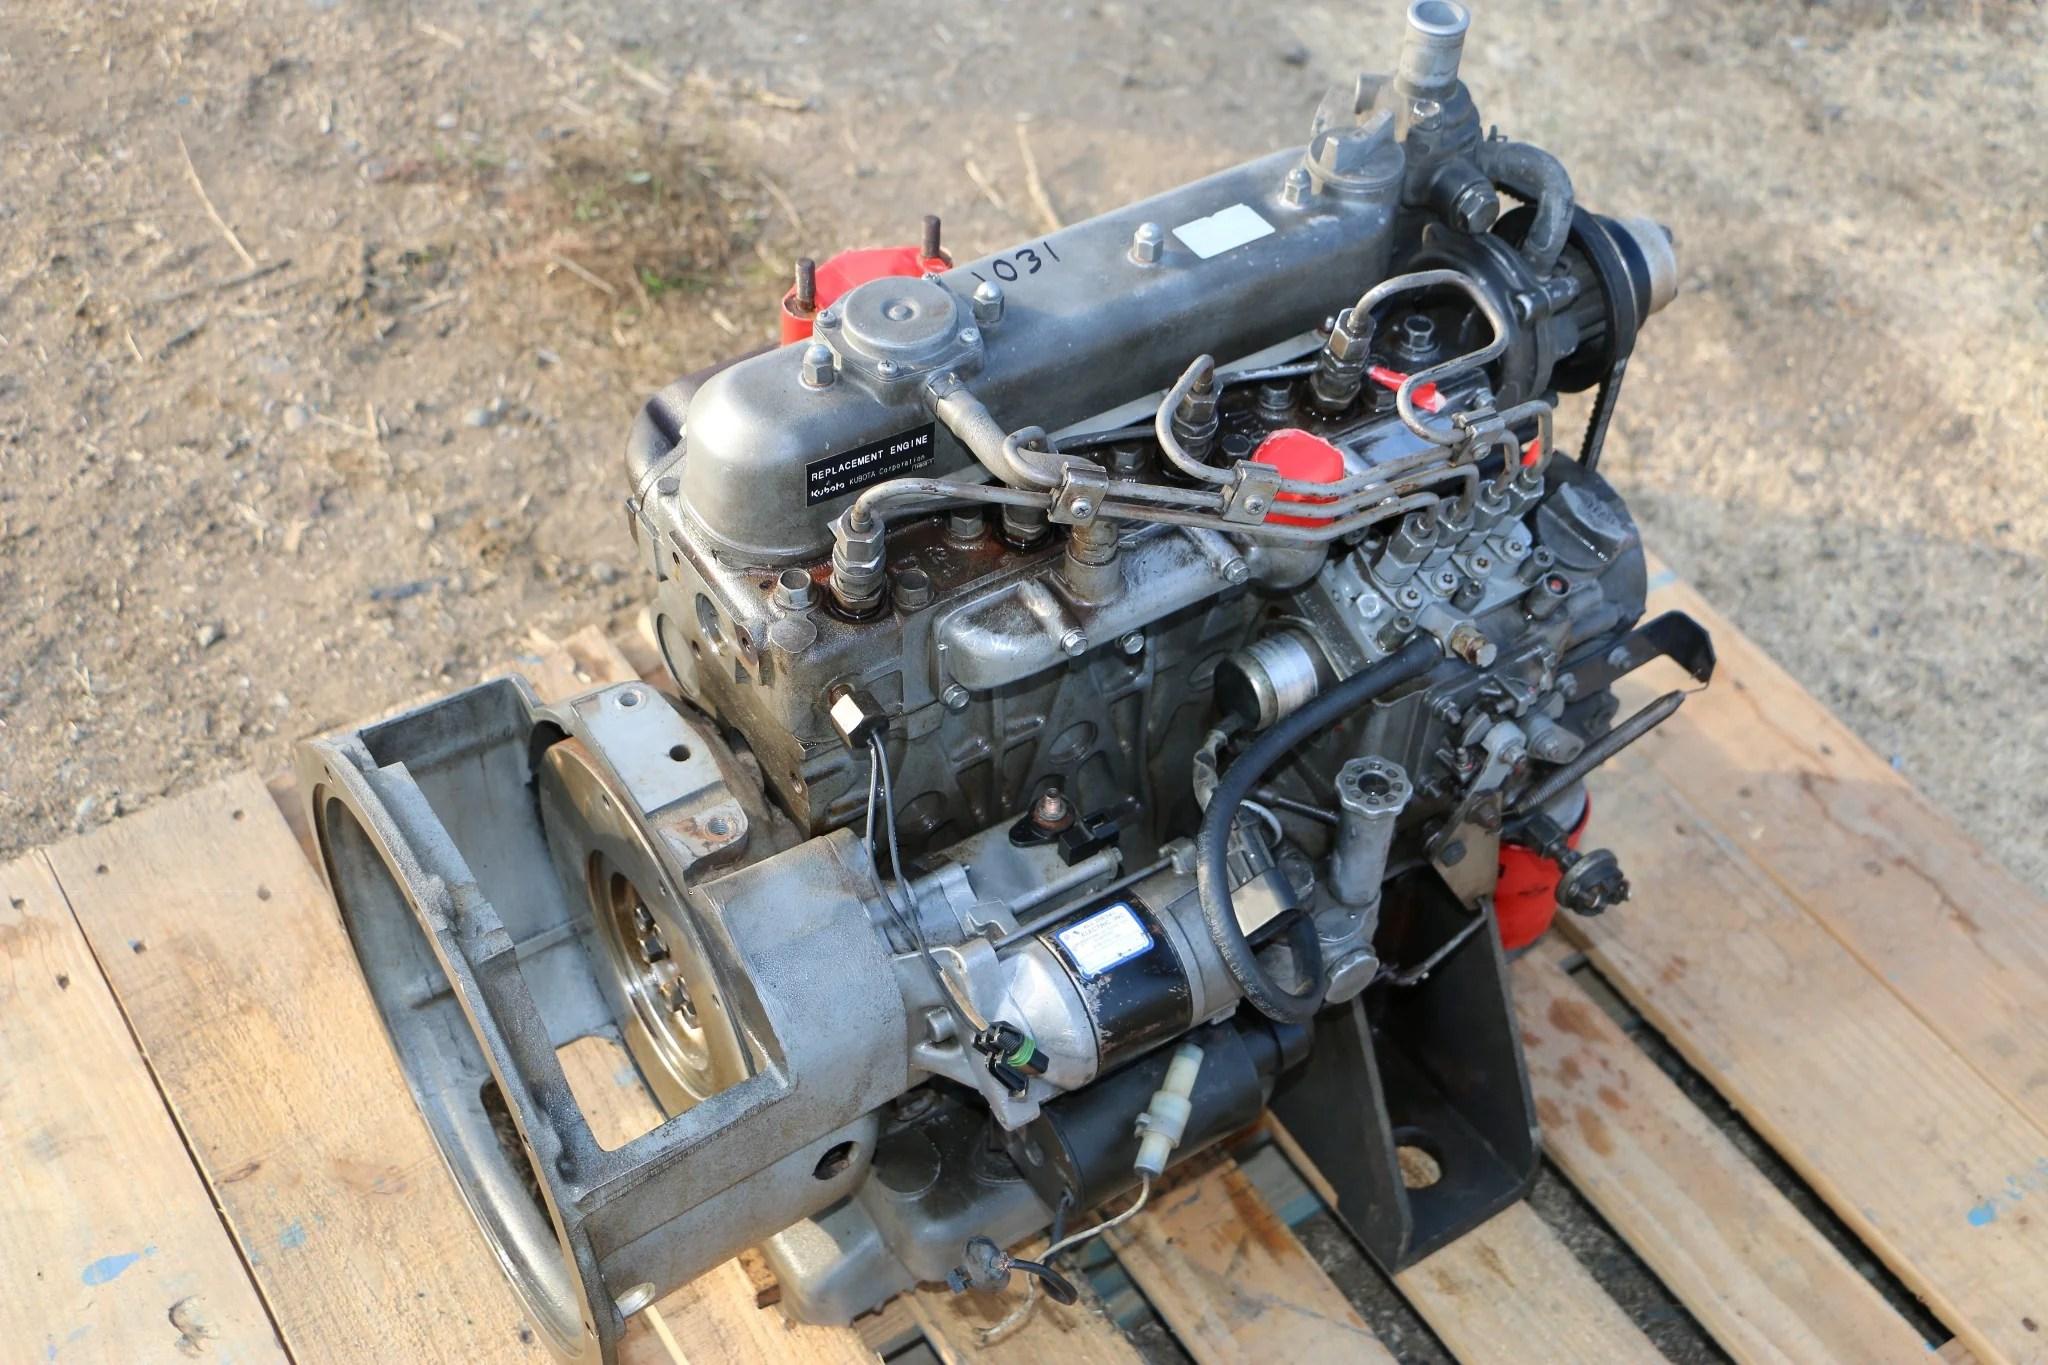 kubota v1505 diesel engine motor for bobcat pump generator etc 1031 [ 2048 x 1365 Pixel ]